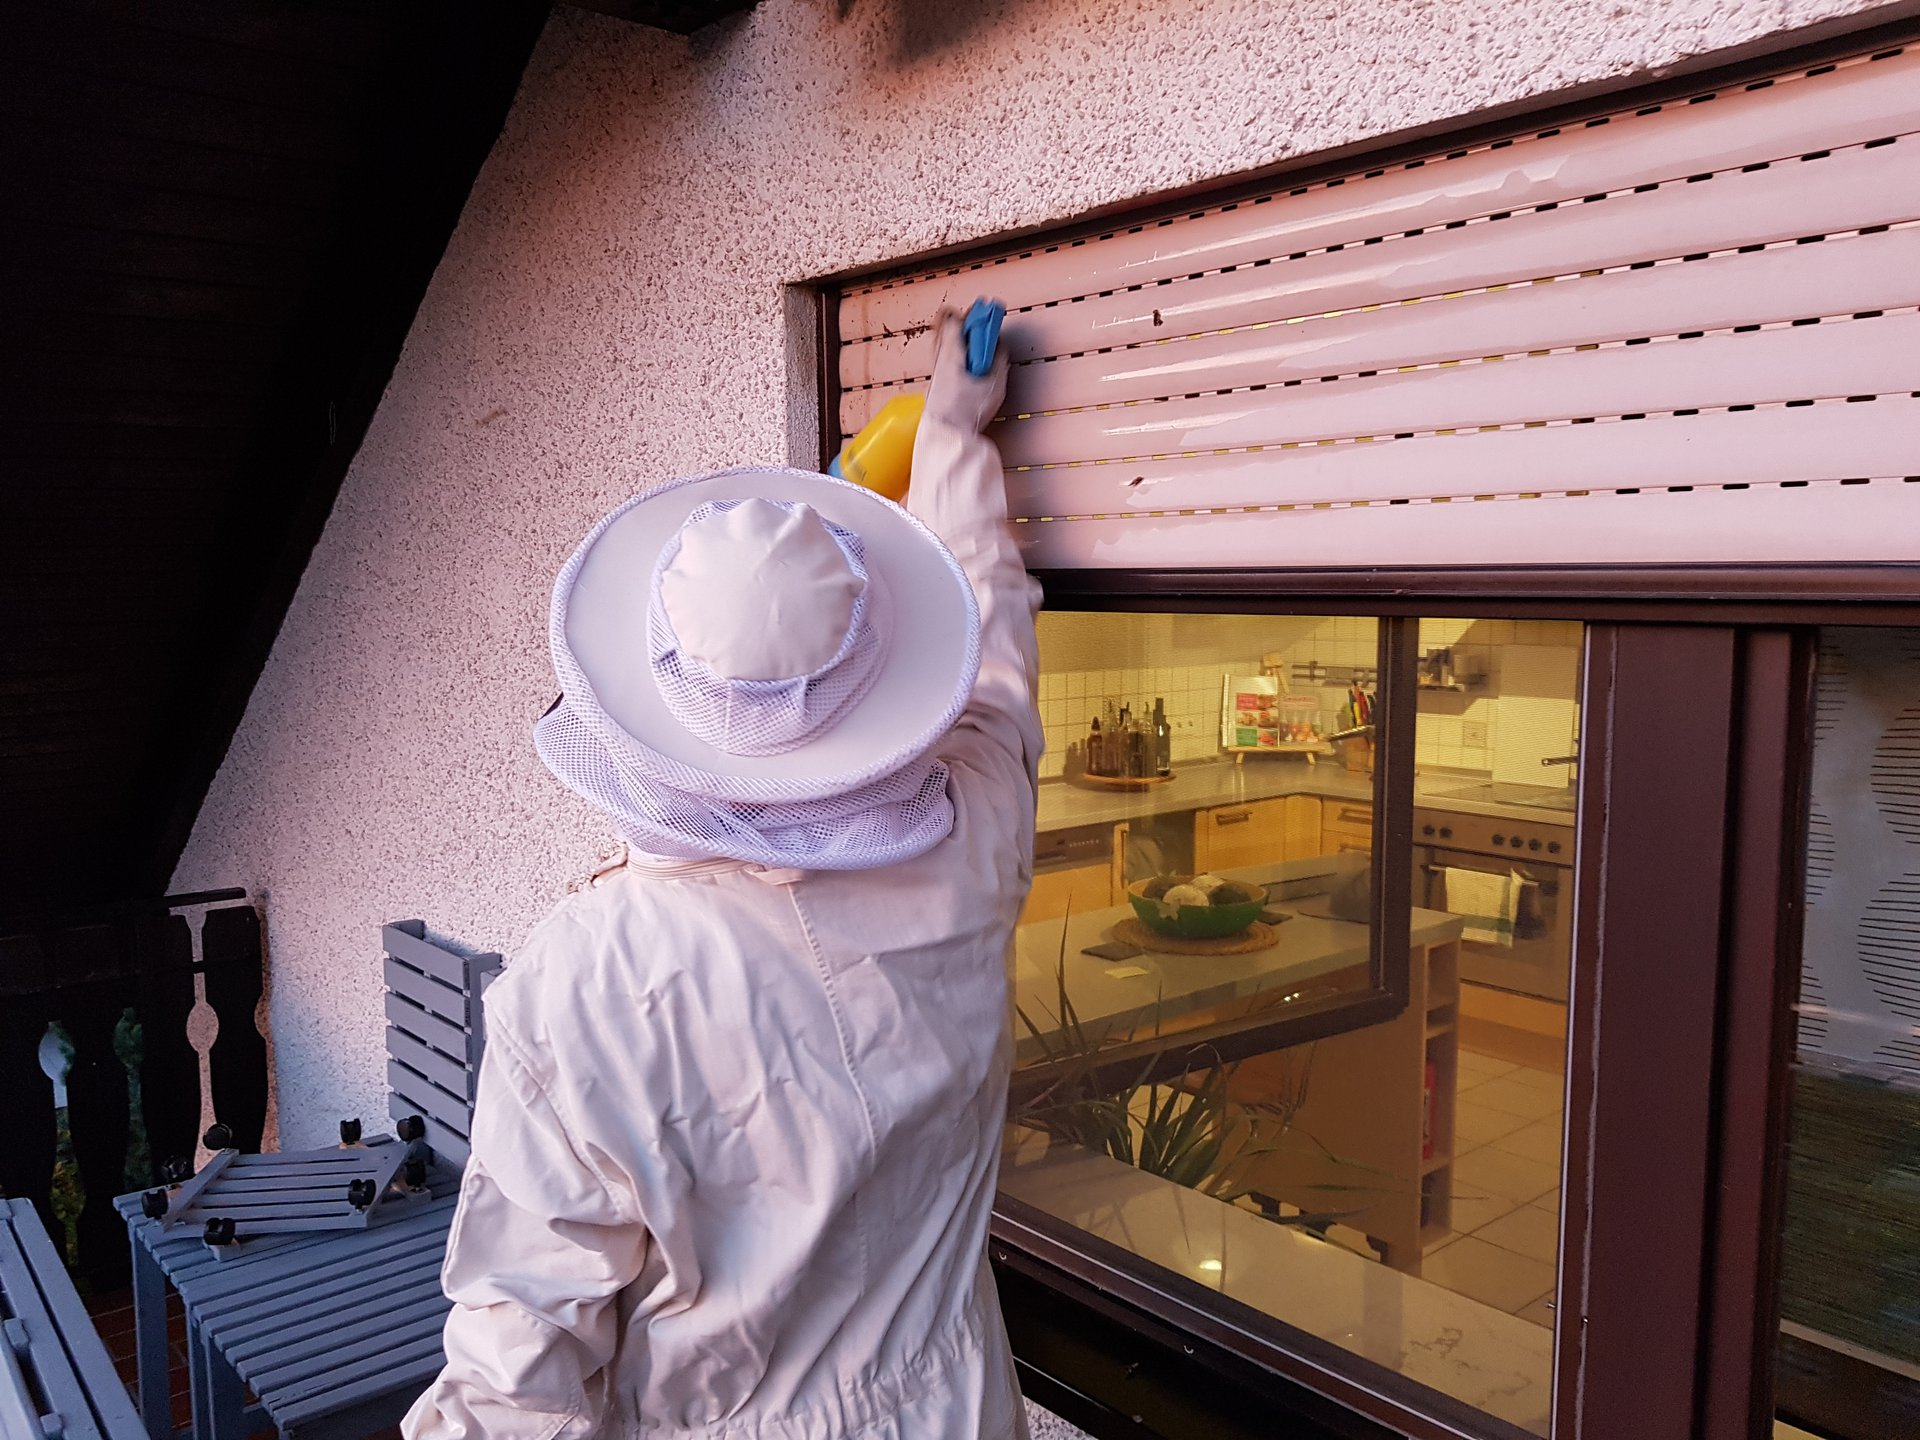 freiwillige feuerwehr illerberg thal insekten. Black Bedroom Furniture Sets. Home Design Ideas